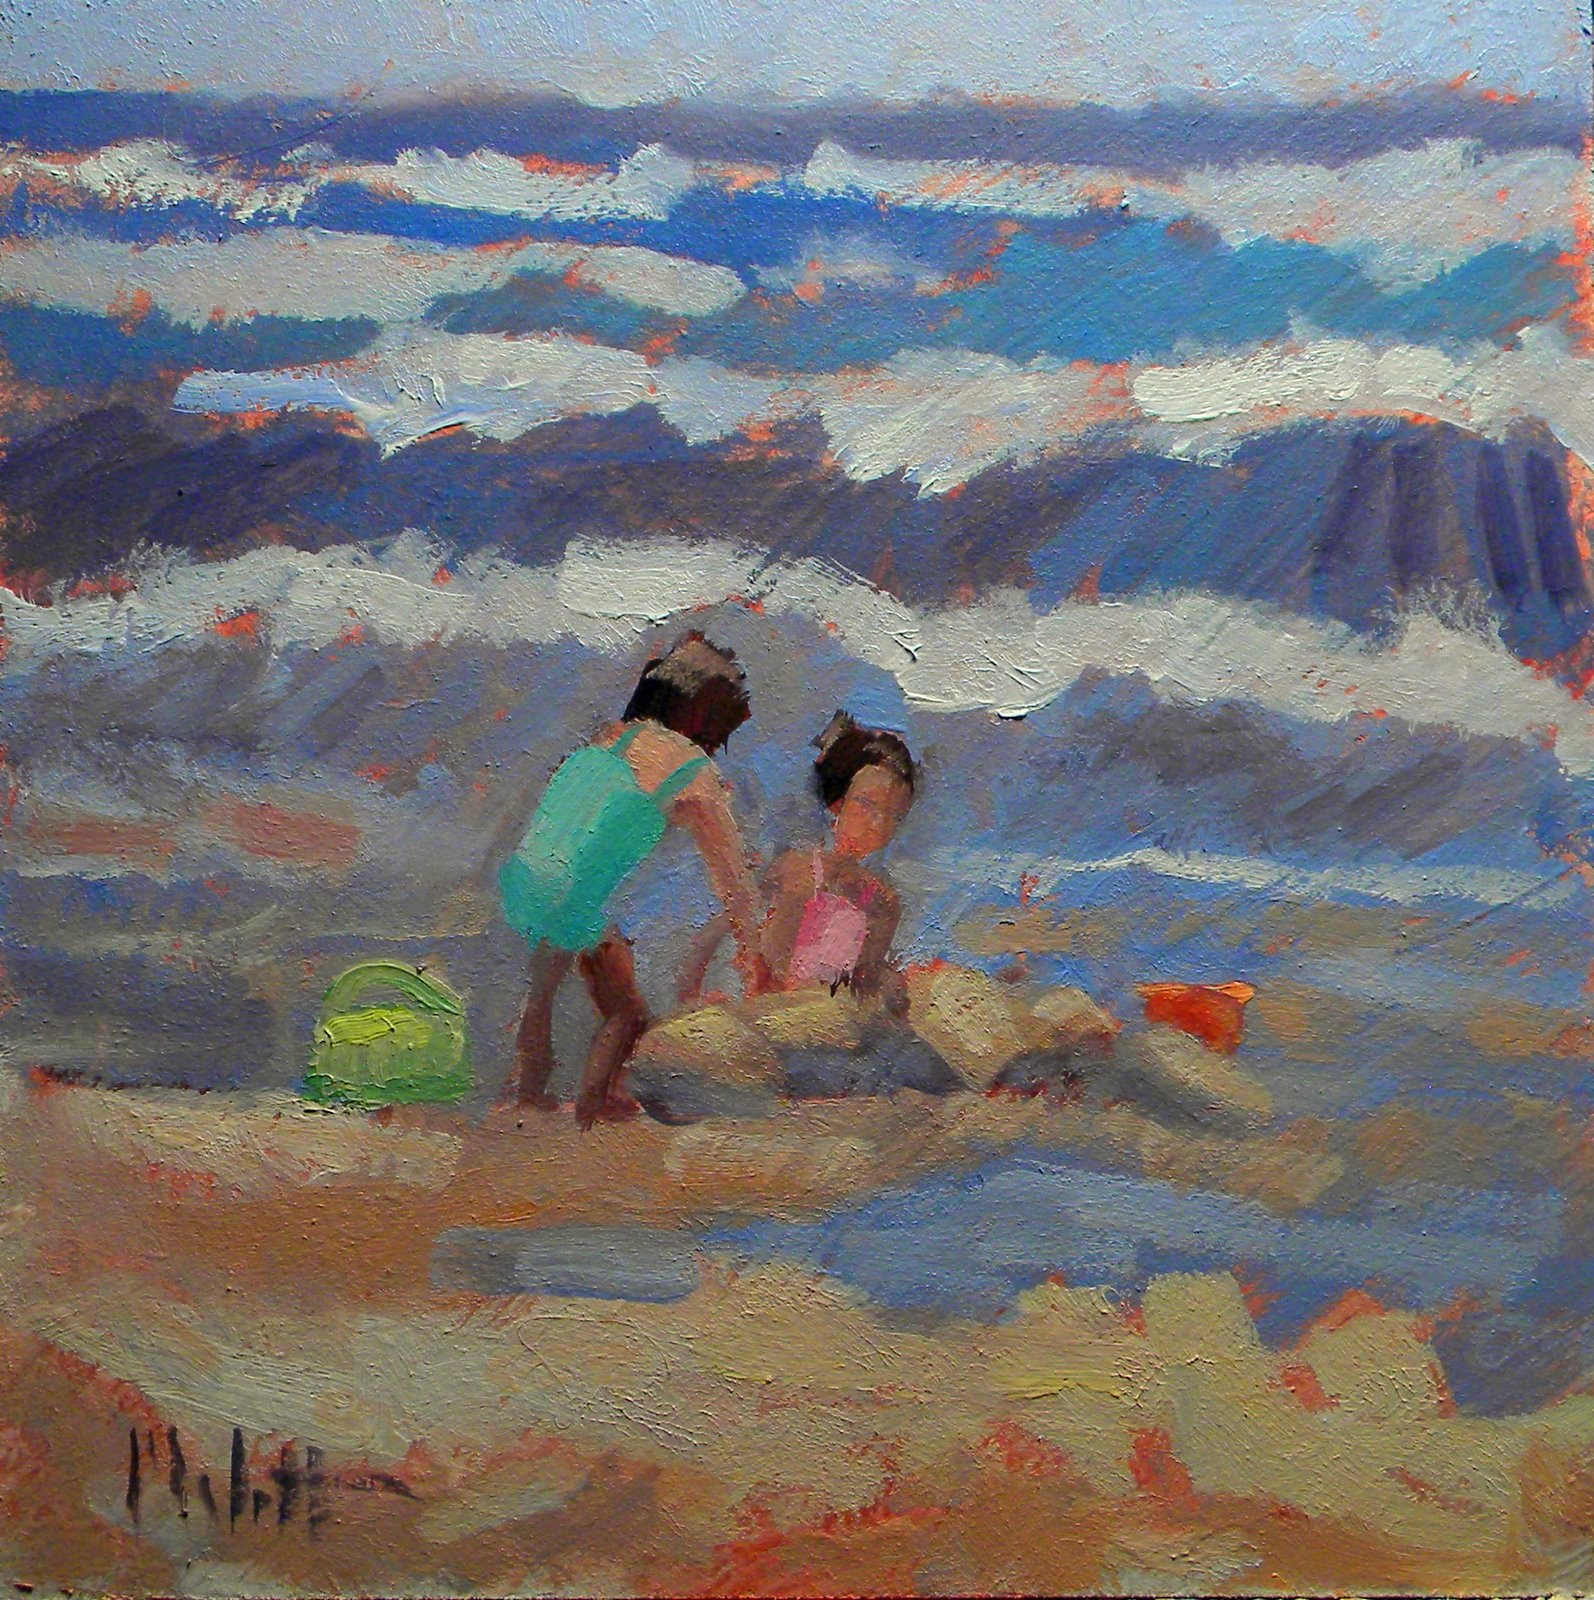 """Sisters Beach Painting Girlfriends Sandcastles Contemporary Impressionism"" original fine art by Heidi Malott"